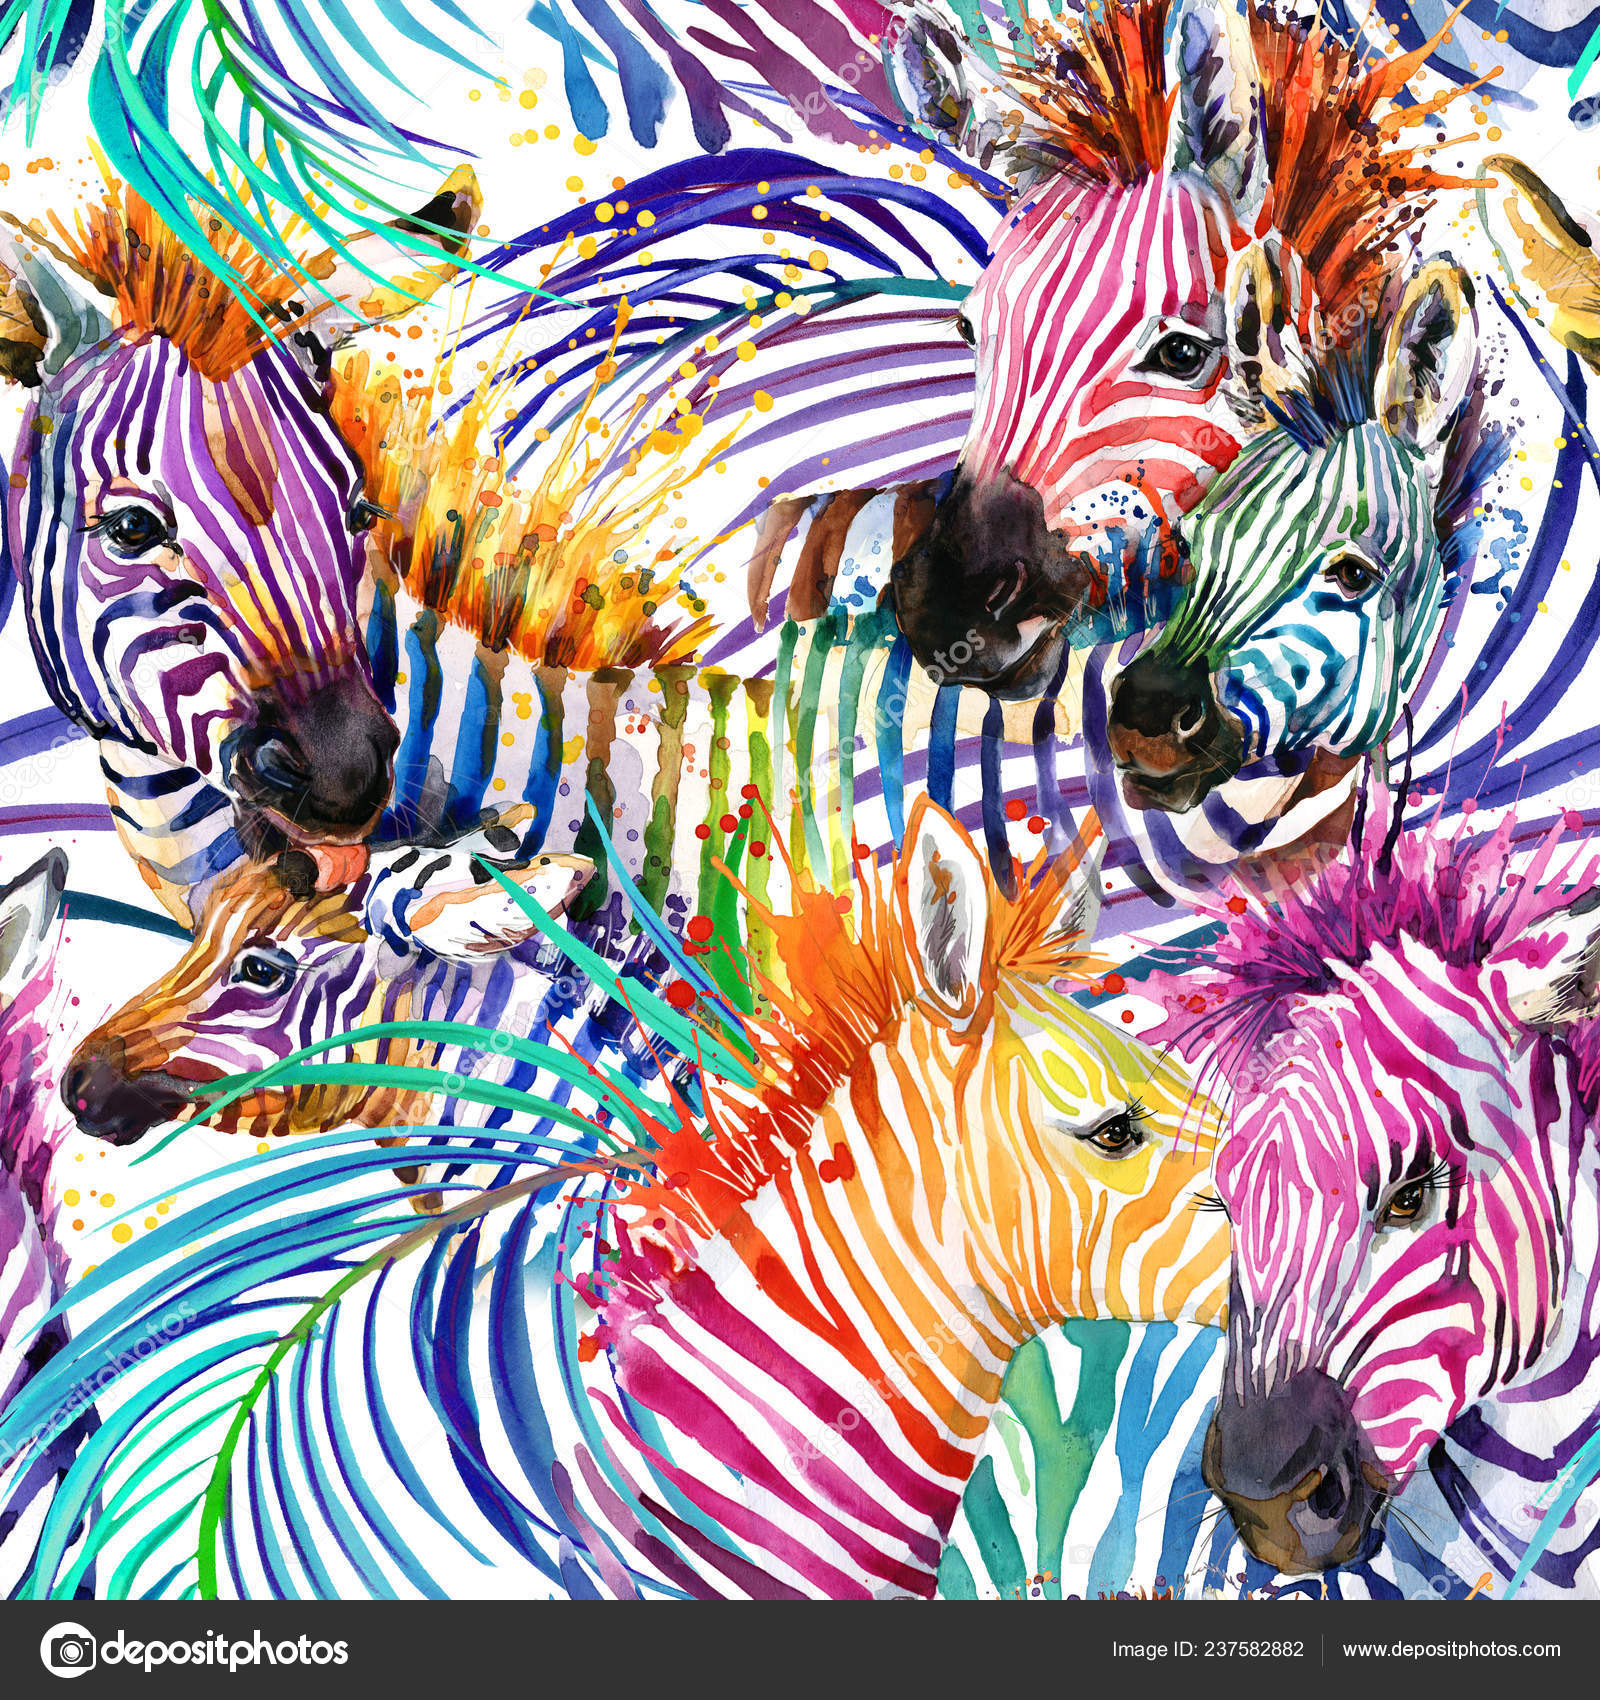 Wallpapers Rainbow Zebra Backgrounds Rainbow Zebra